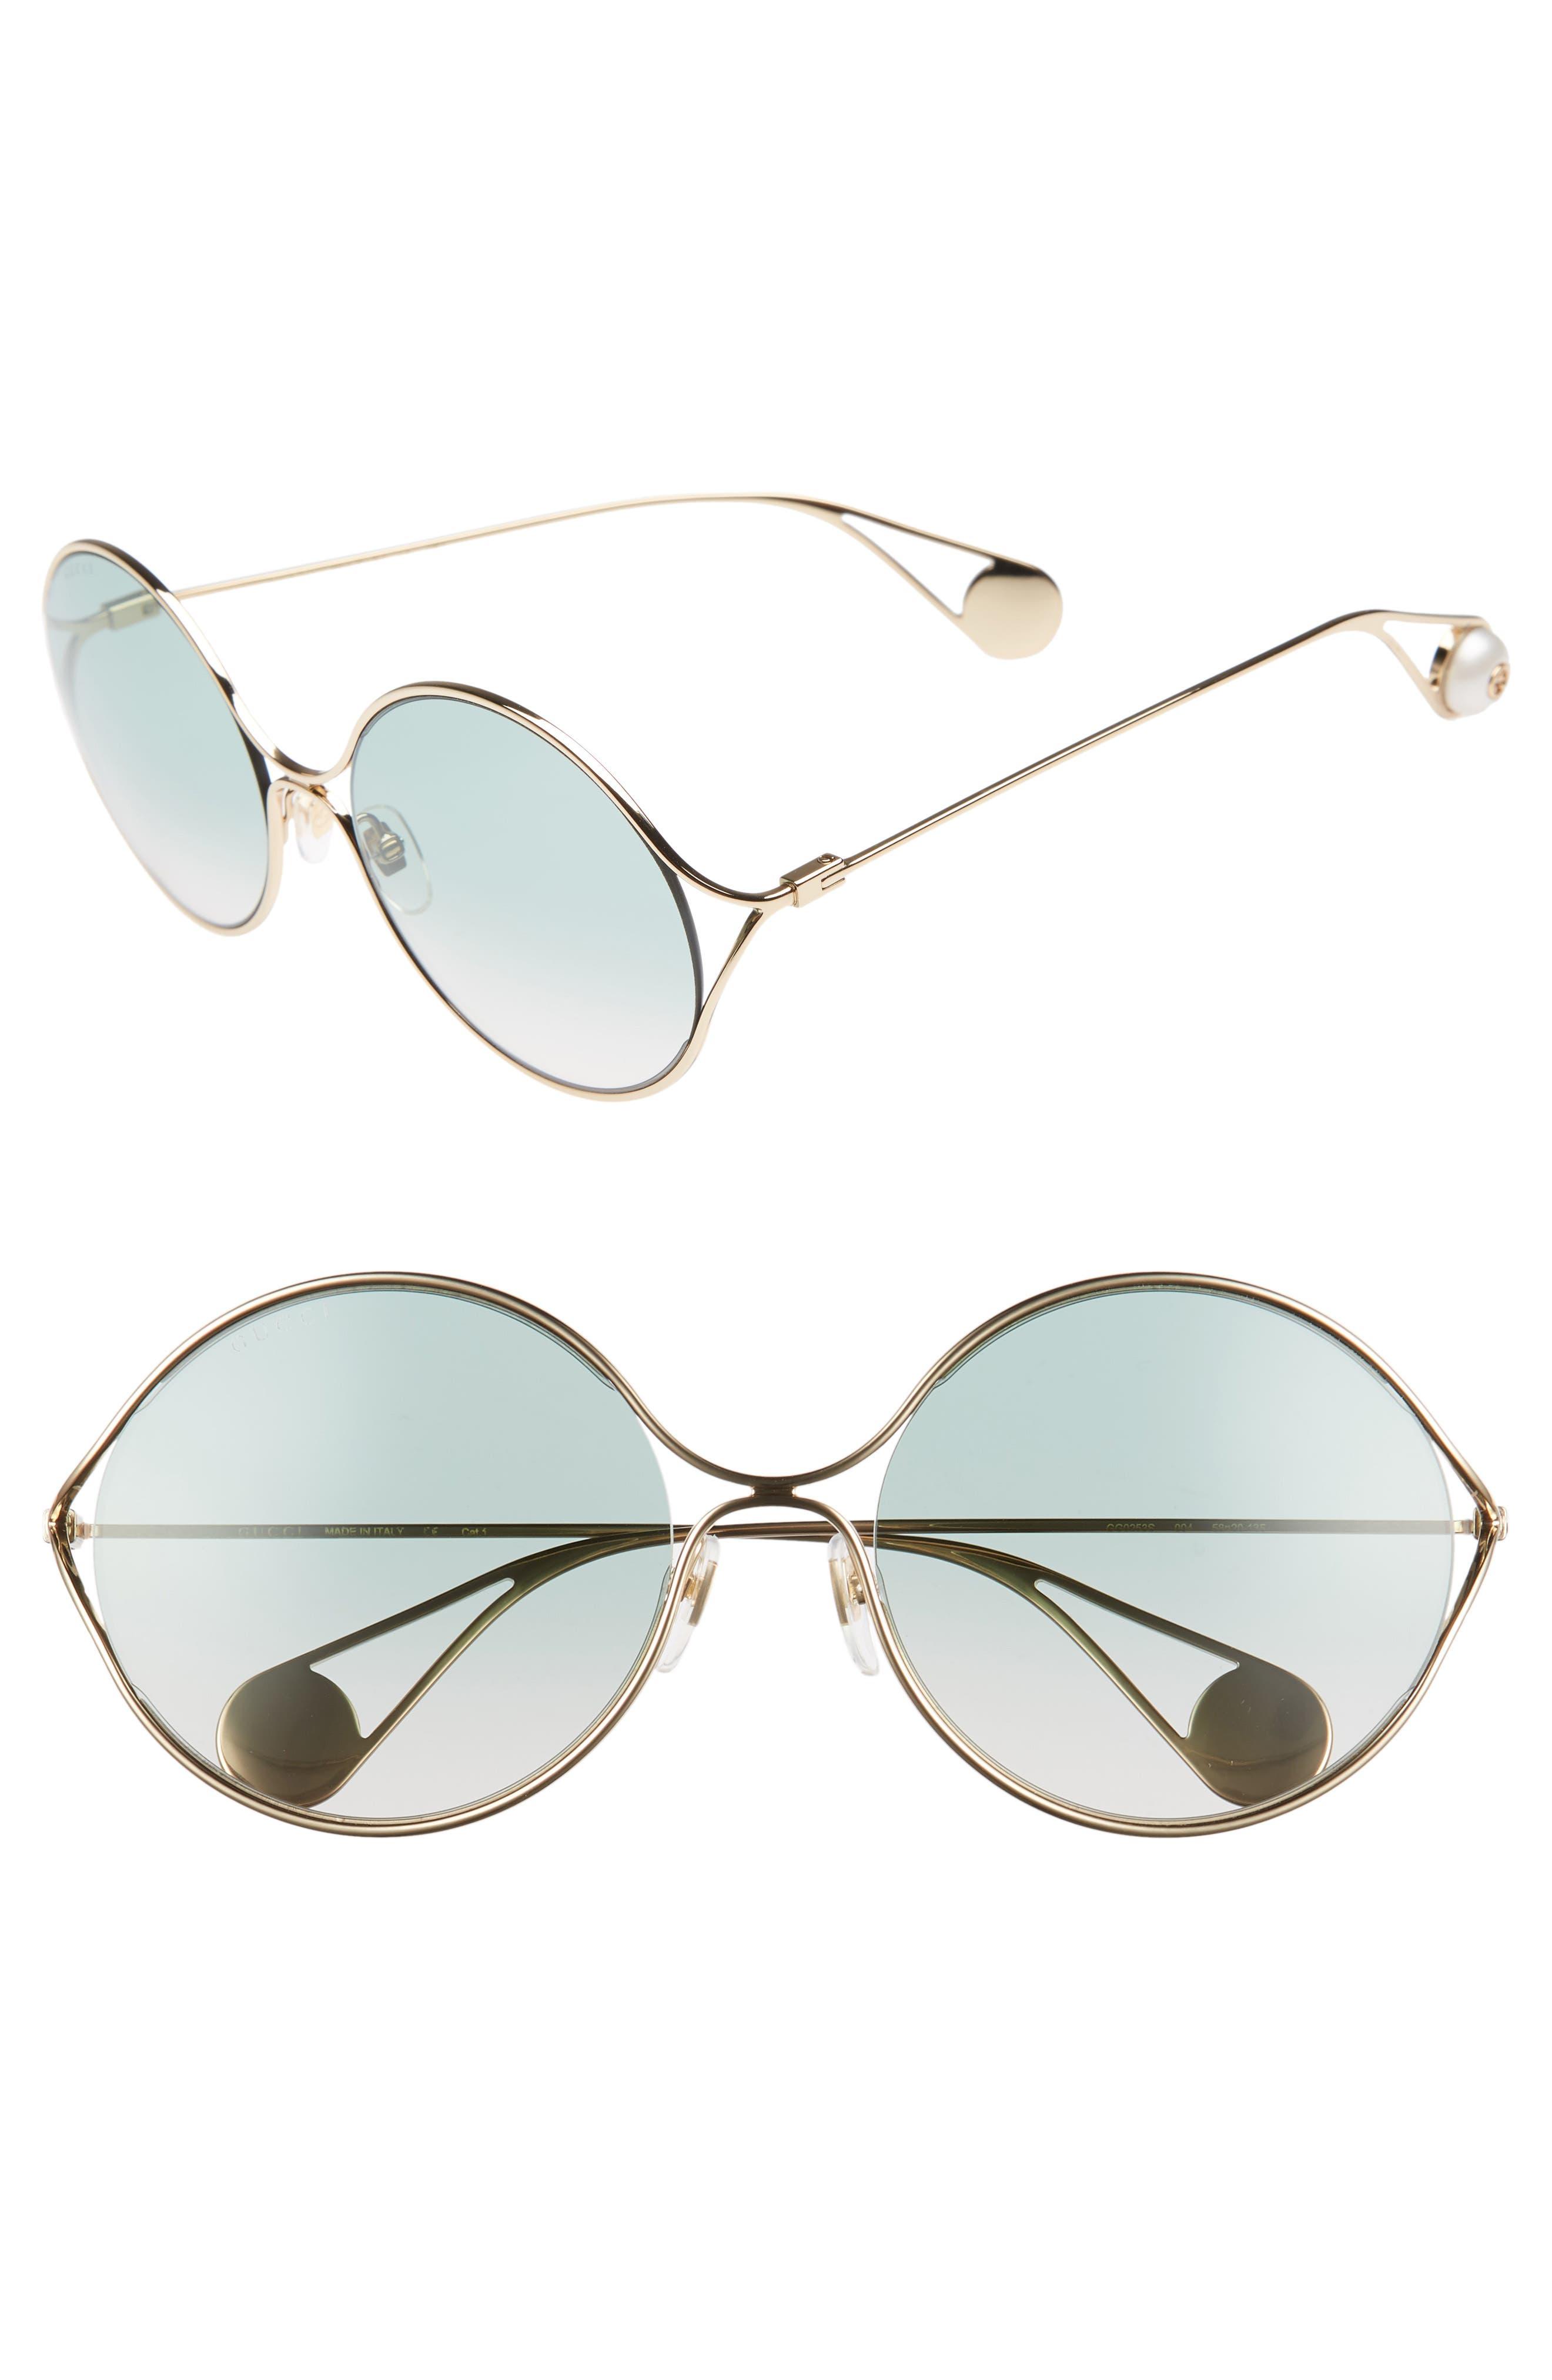 58mm Gradient Lens Round Sunglasses,                             Main thumbnail 1, color,                             GOLD/ SAGE/ PINK